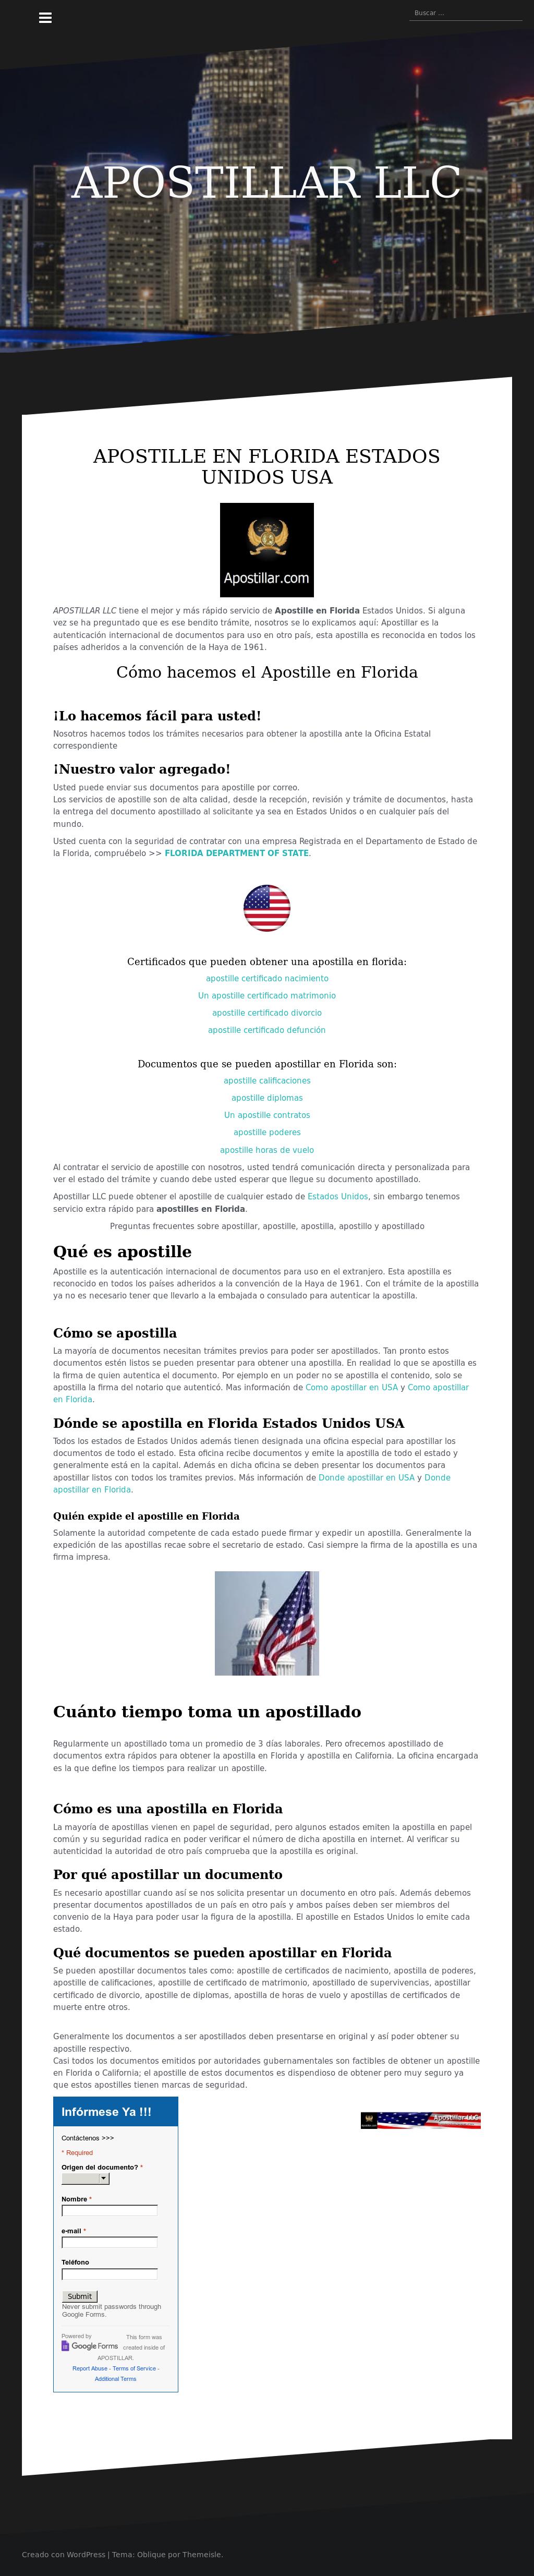 Apostillar Usa Florida Competitors, Revenue and Employees - Owler ...